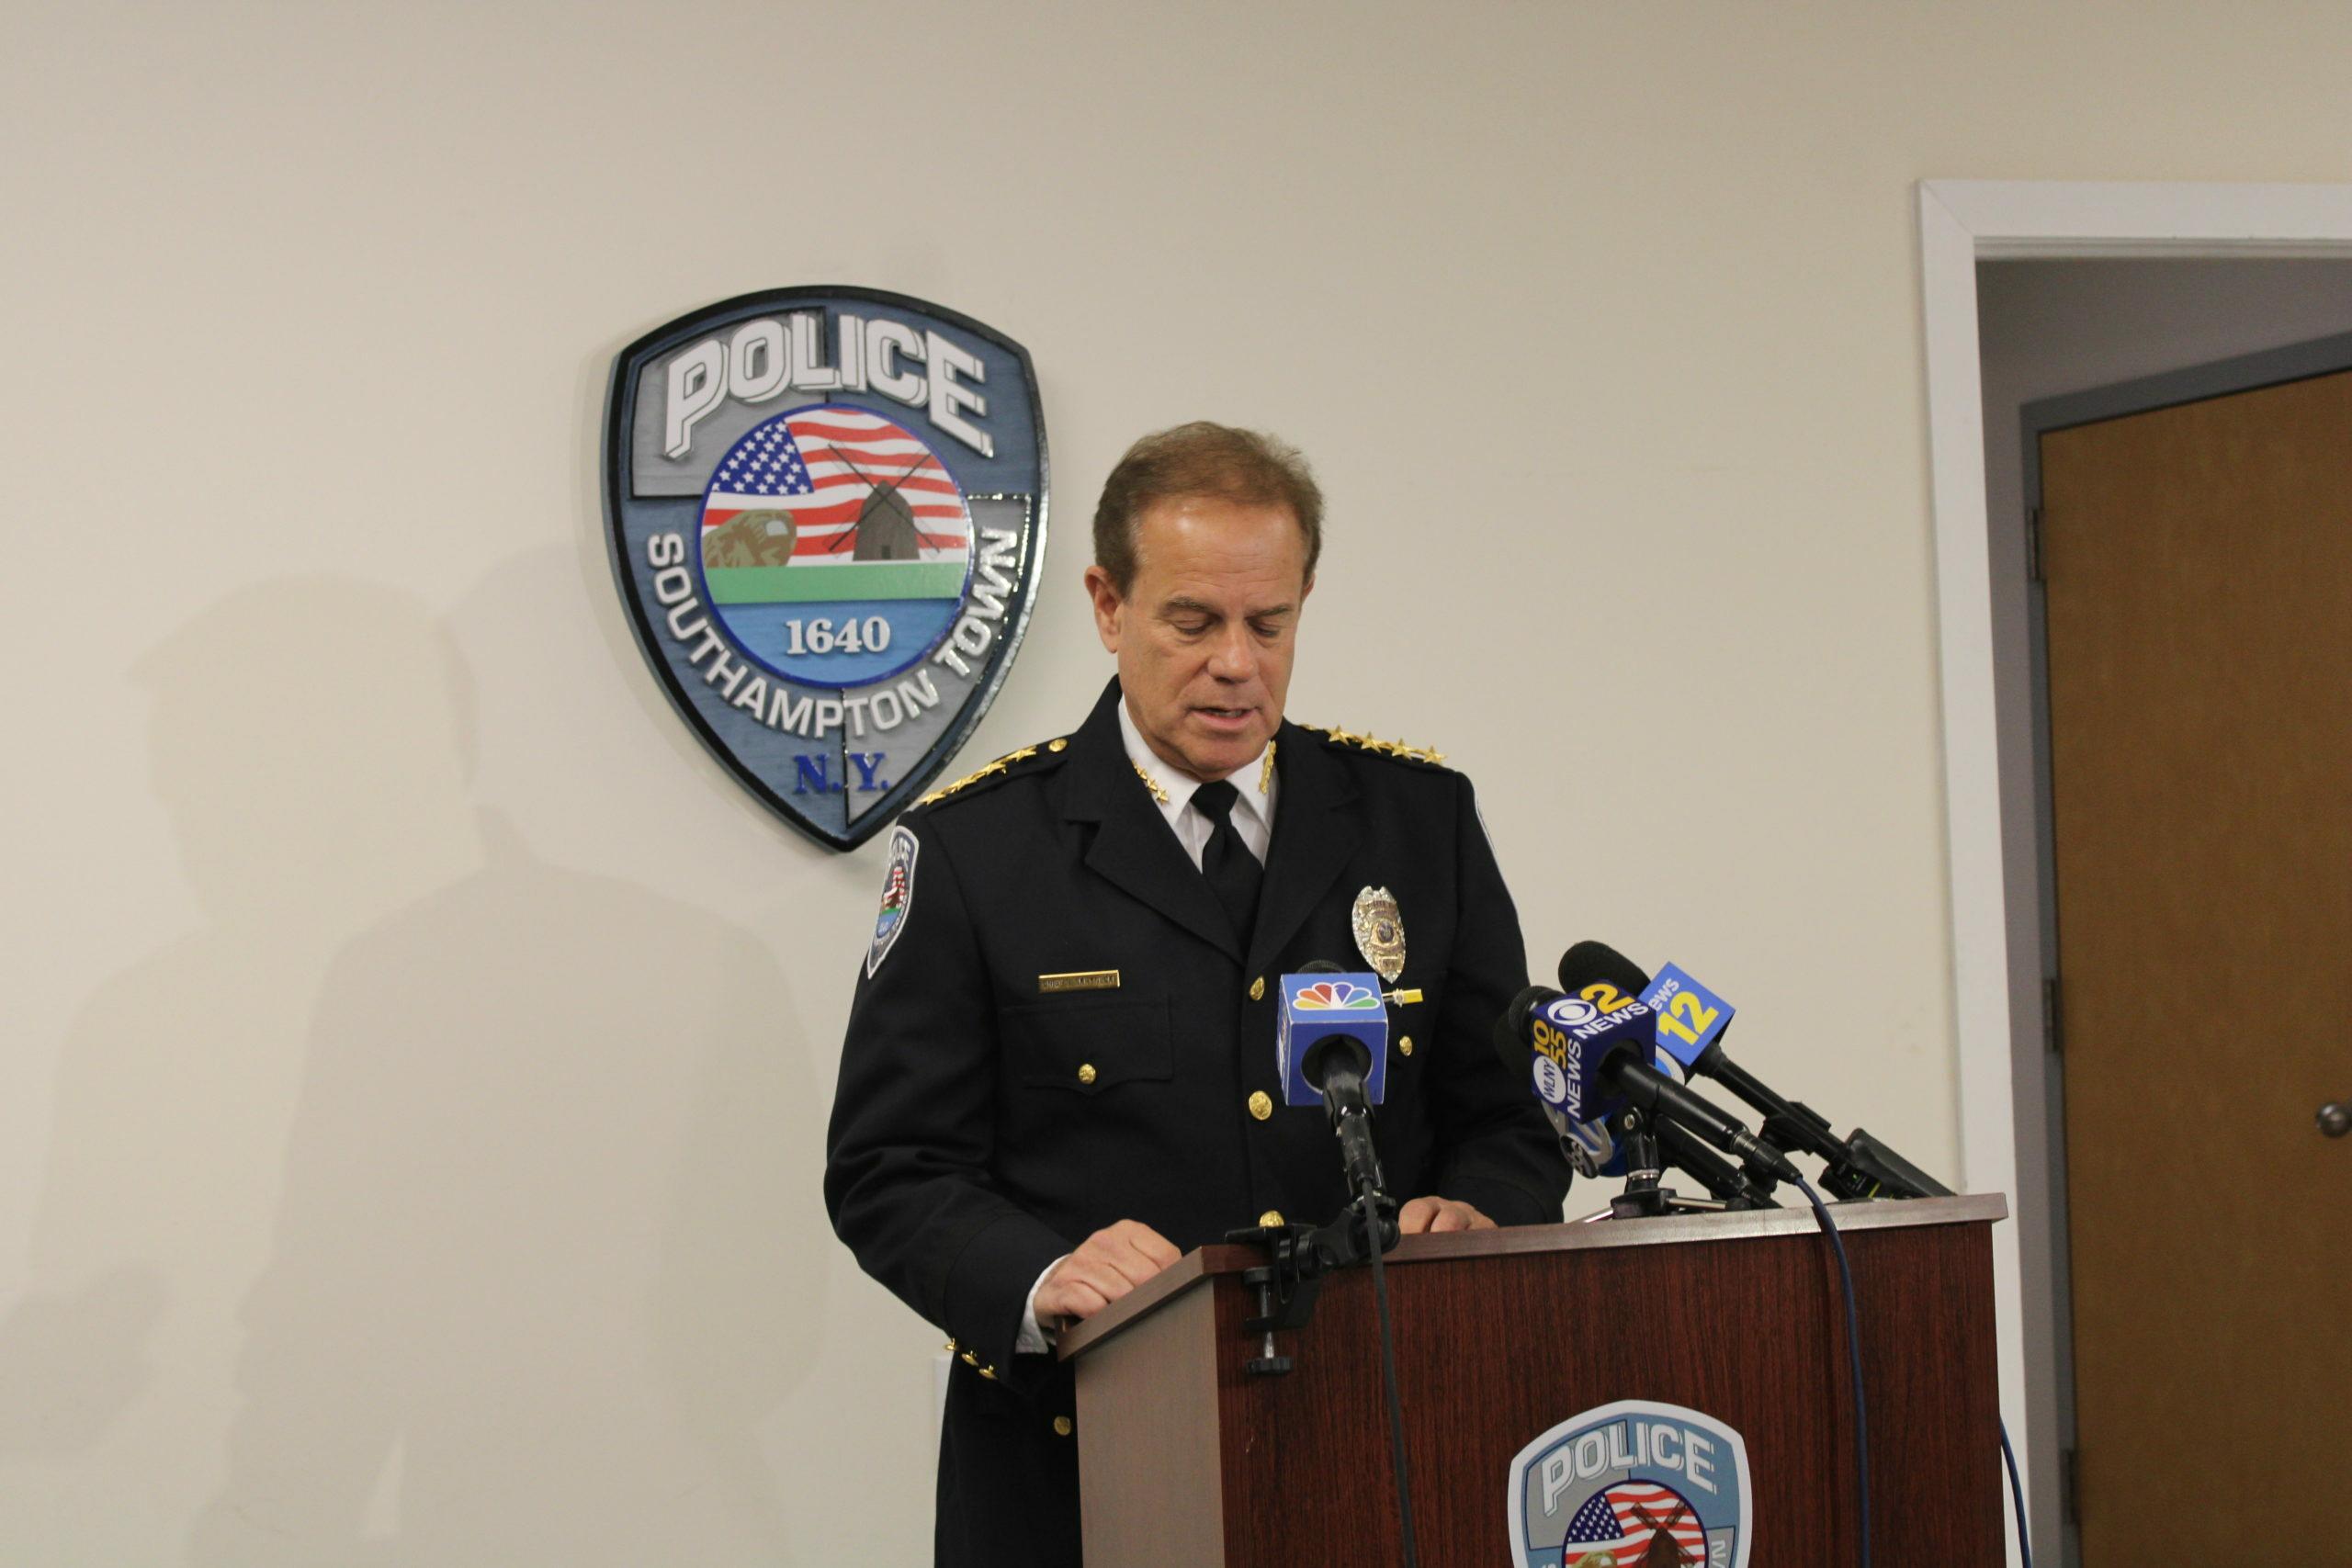 Southampton Town Police Chief Steven Skrynecki